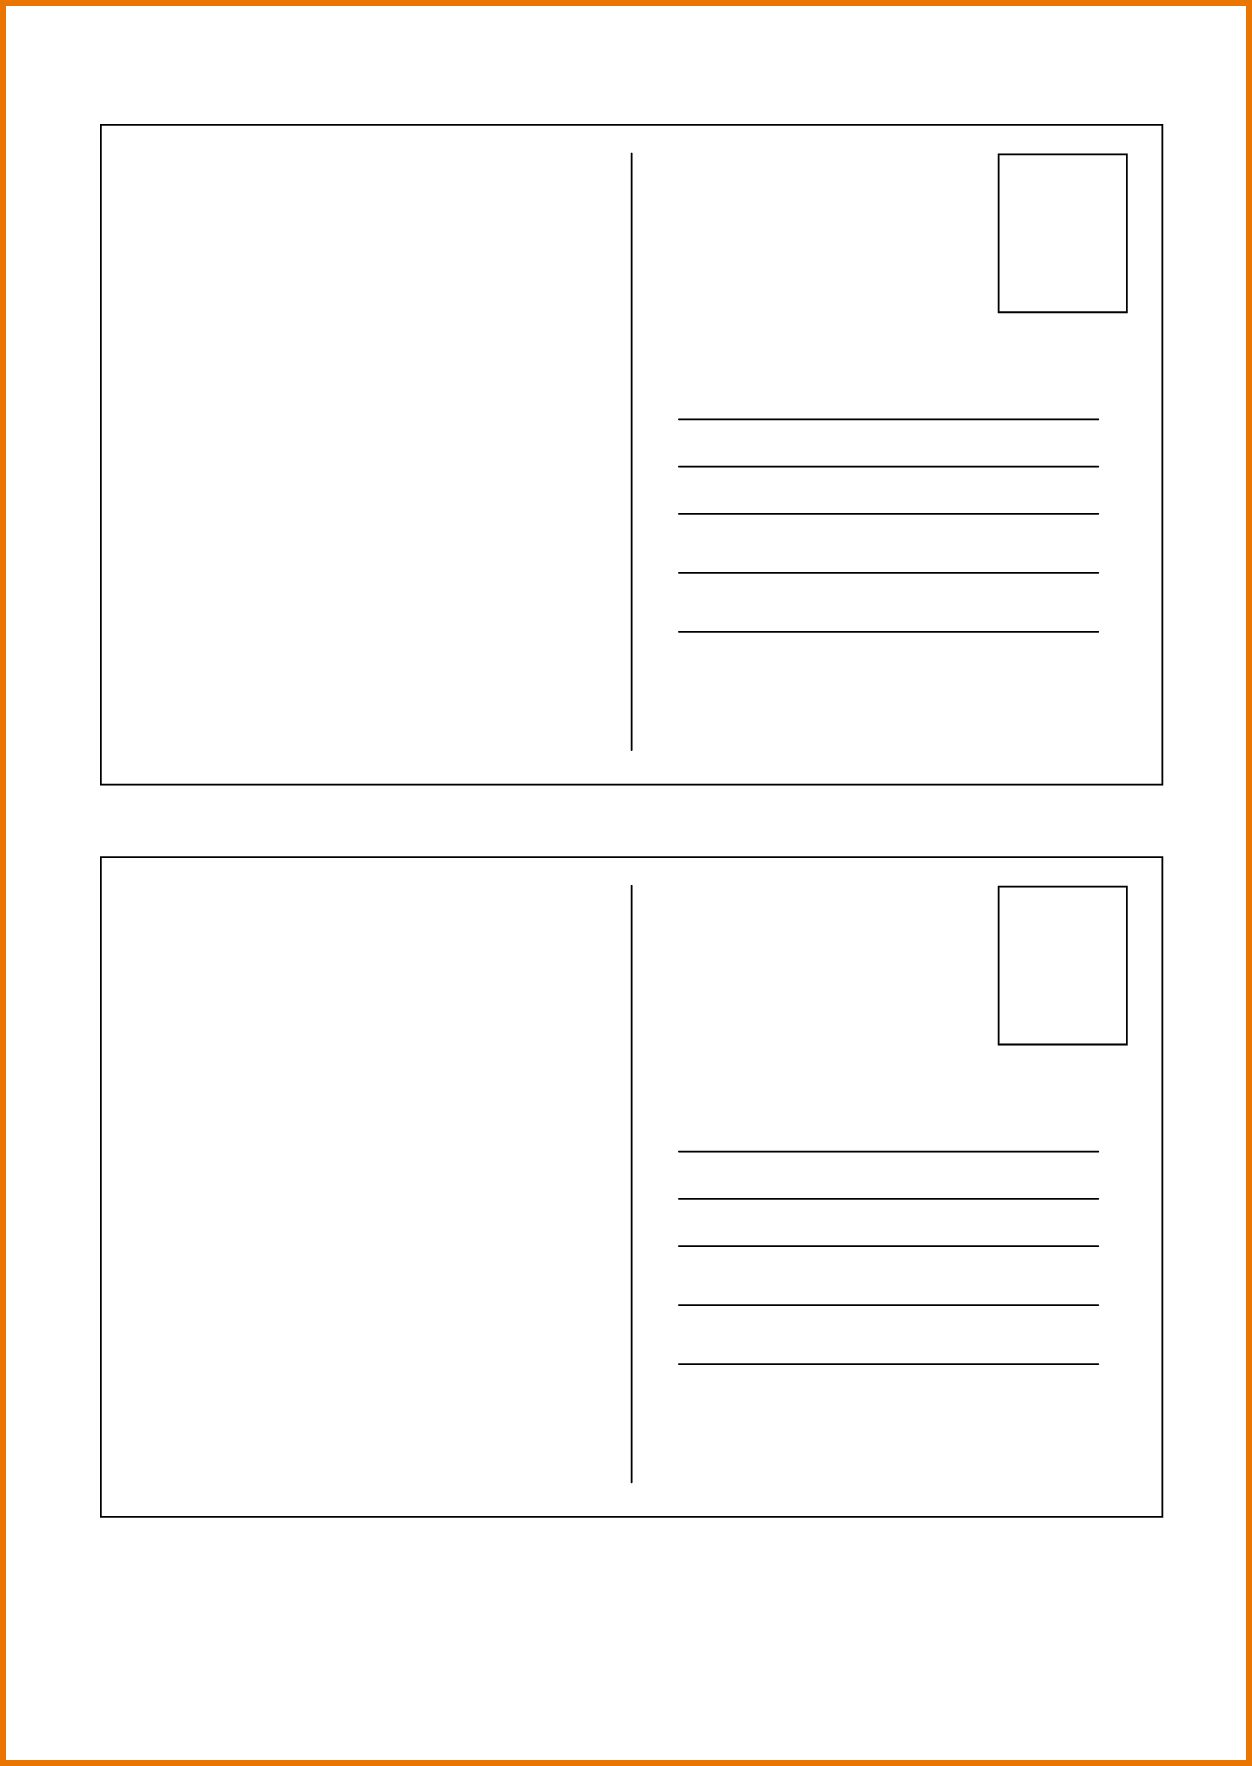 Postcard Template Postcard Printing Postcard Template Postcard - Free Printable Postcard Template